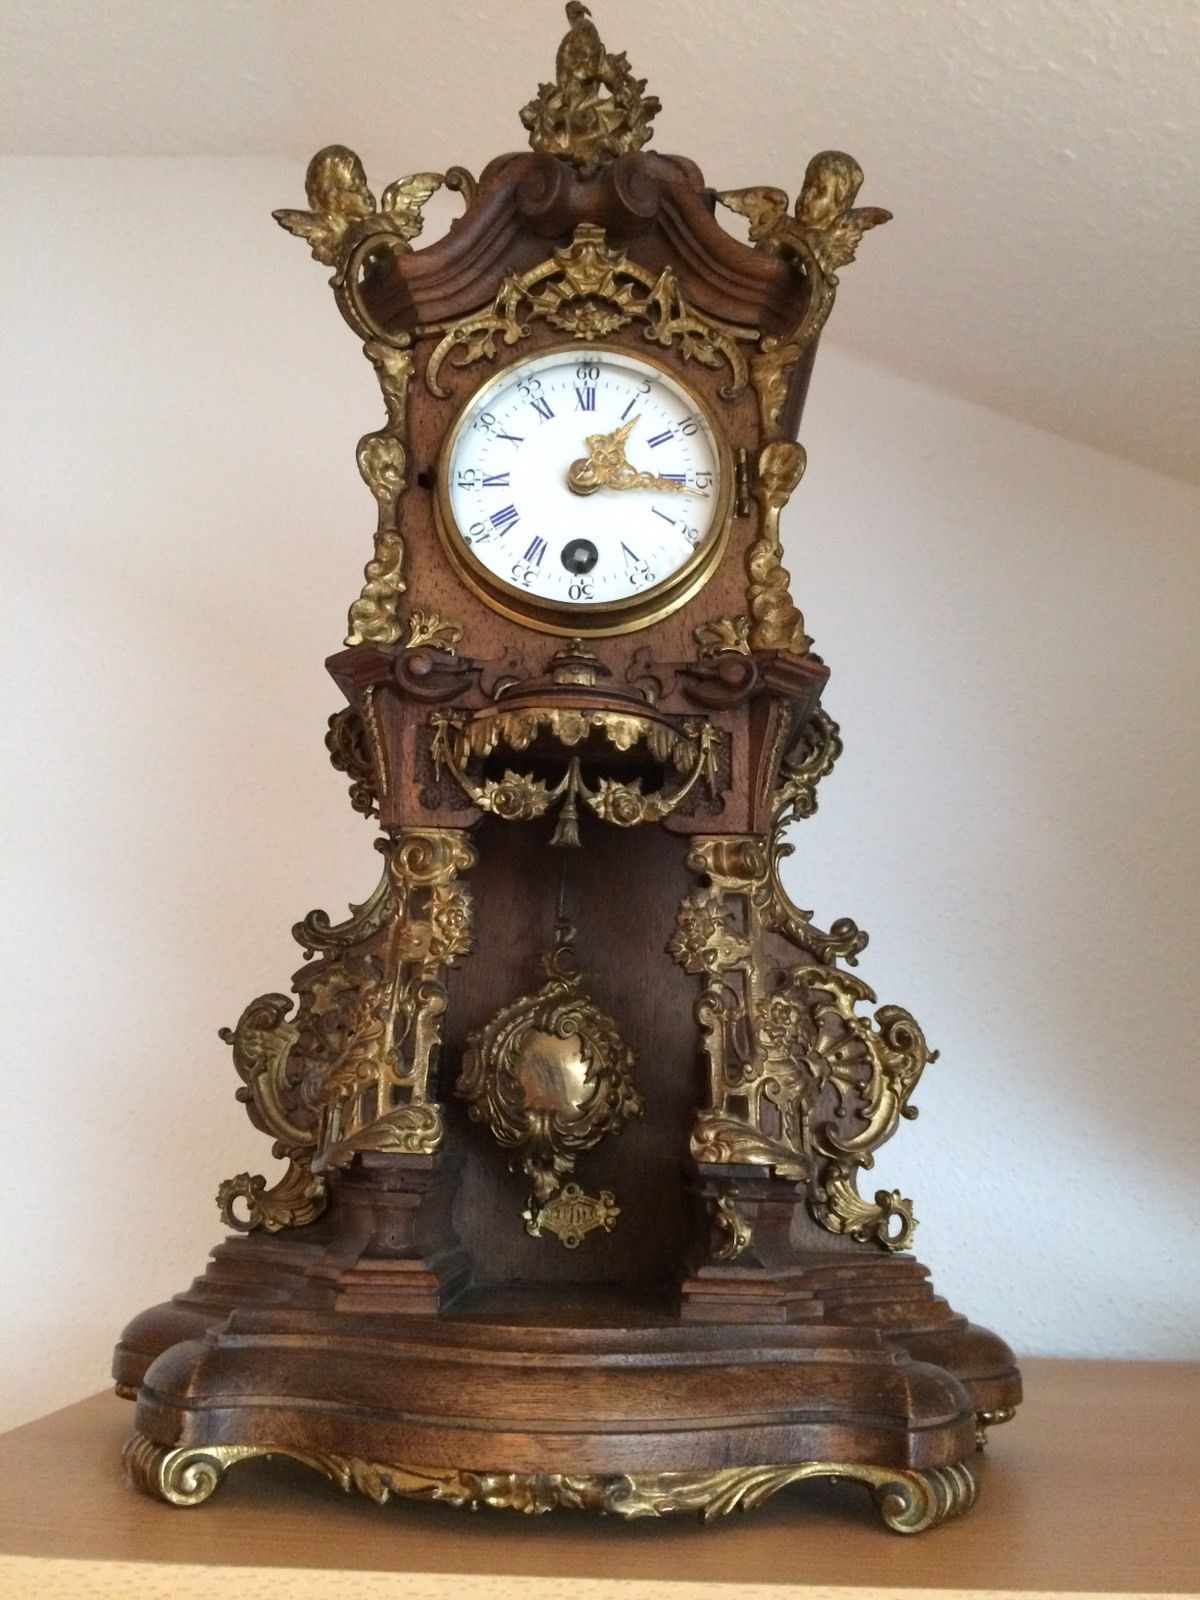 Lenzkirch Kaminuhr Mit Pendel Ca Um 1880 Ebay Antique Wall Clocks Antique Clocks Vintage Clock